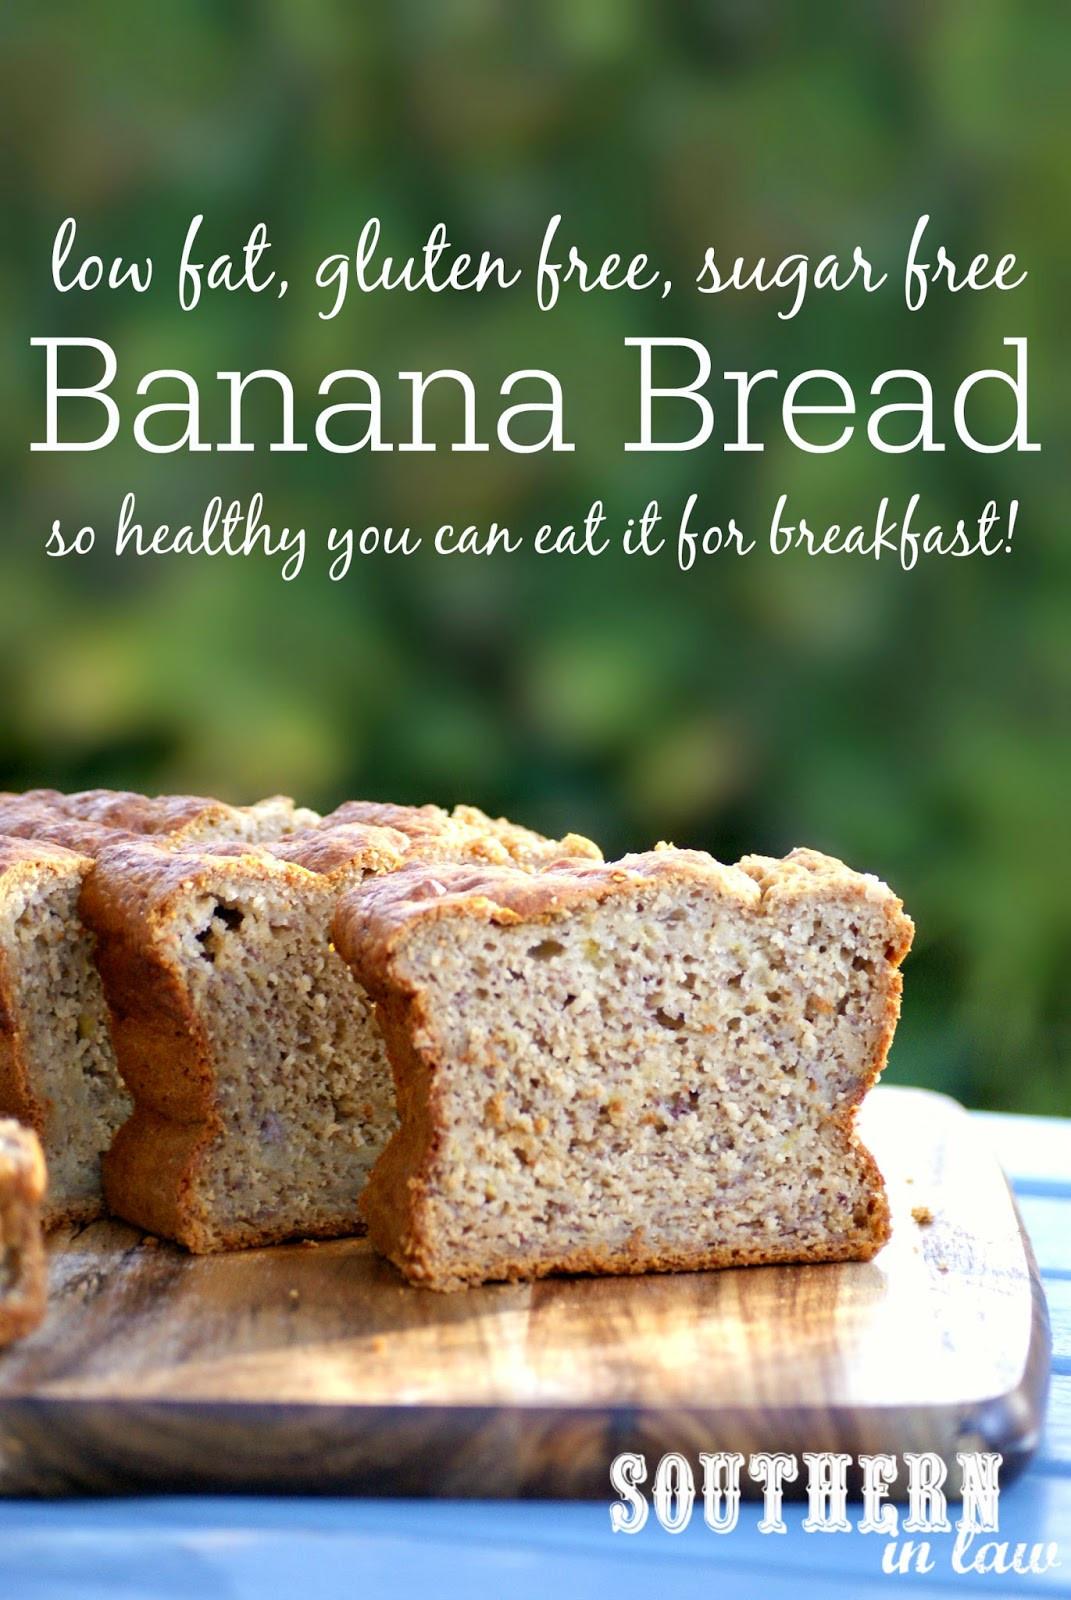 Healthy Gluten Free Bread Recipes  Southern In Law Recipe The Best Healthy Banana Bread